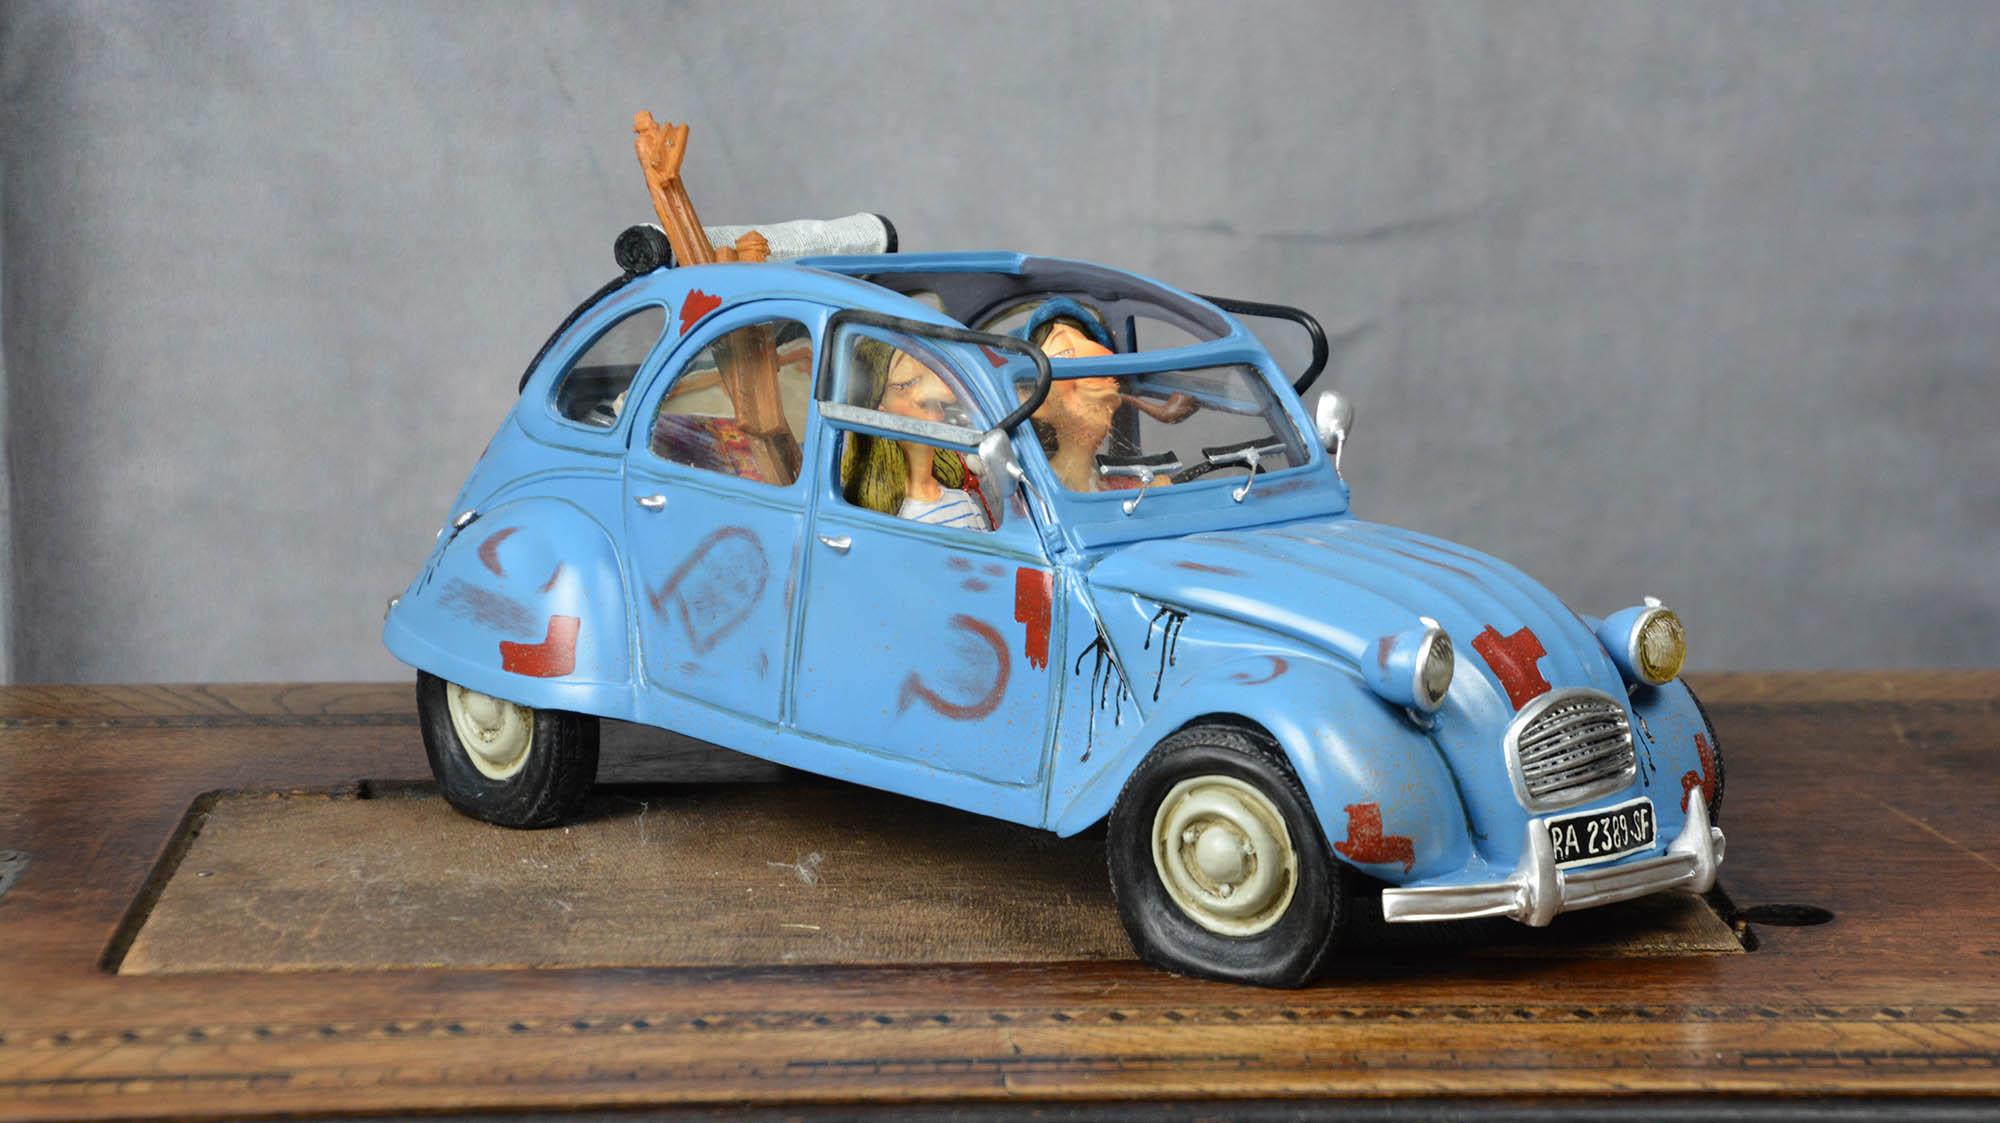 boutique figurine piece artisanale vehicule deux chevaux parodie